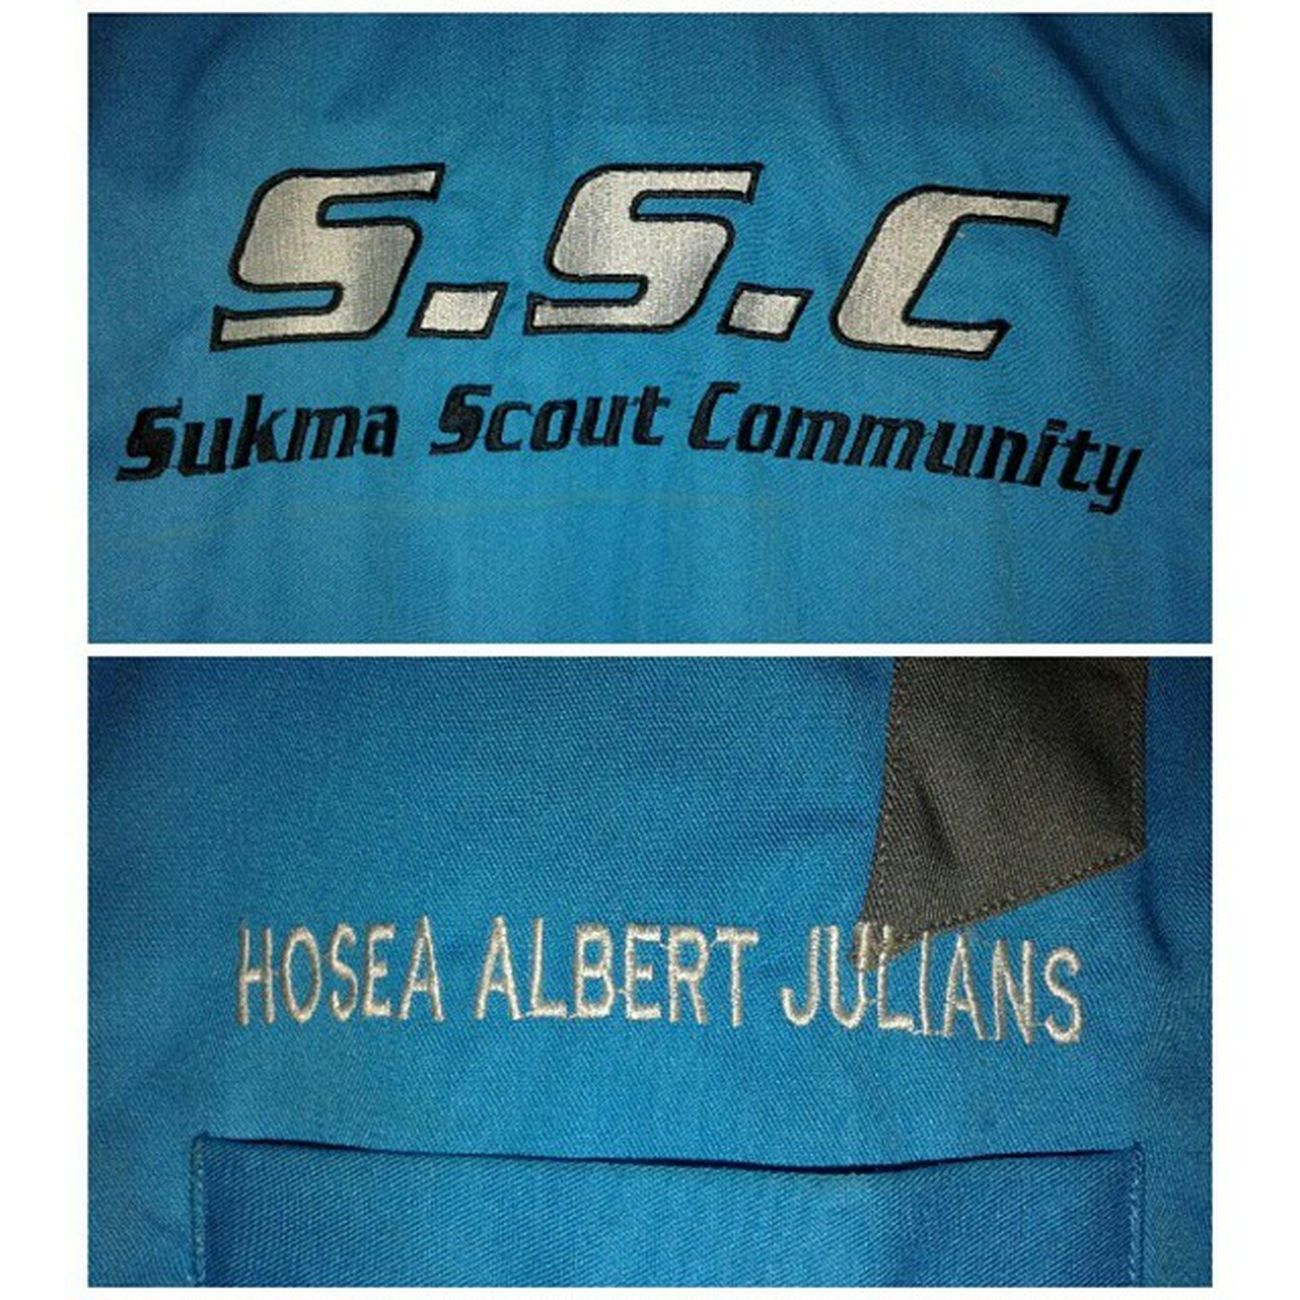 "Kemeja Baru ""Puji Tuhan"" Scout SSC Pramuka Kalbar sukma"